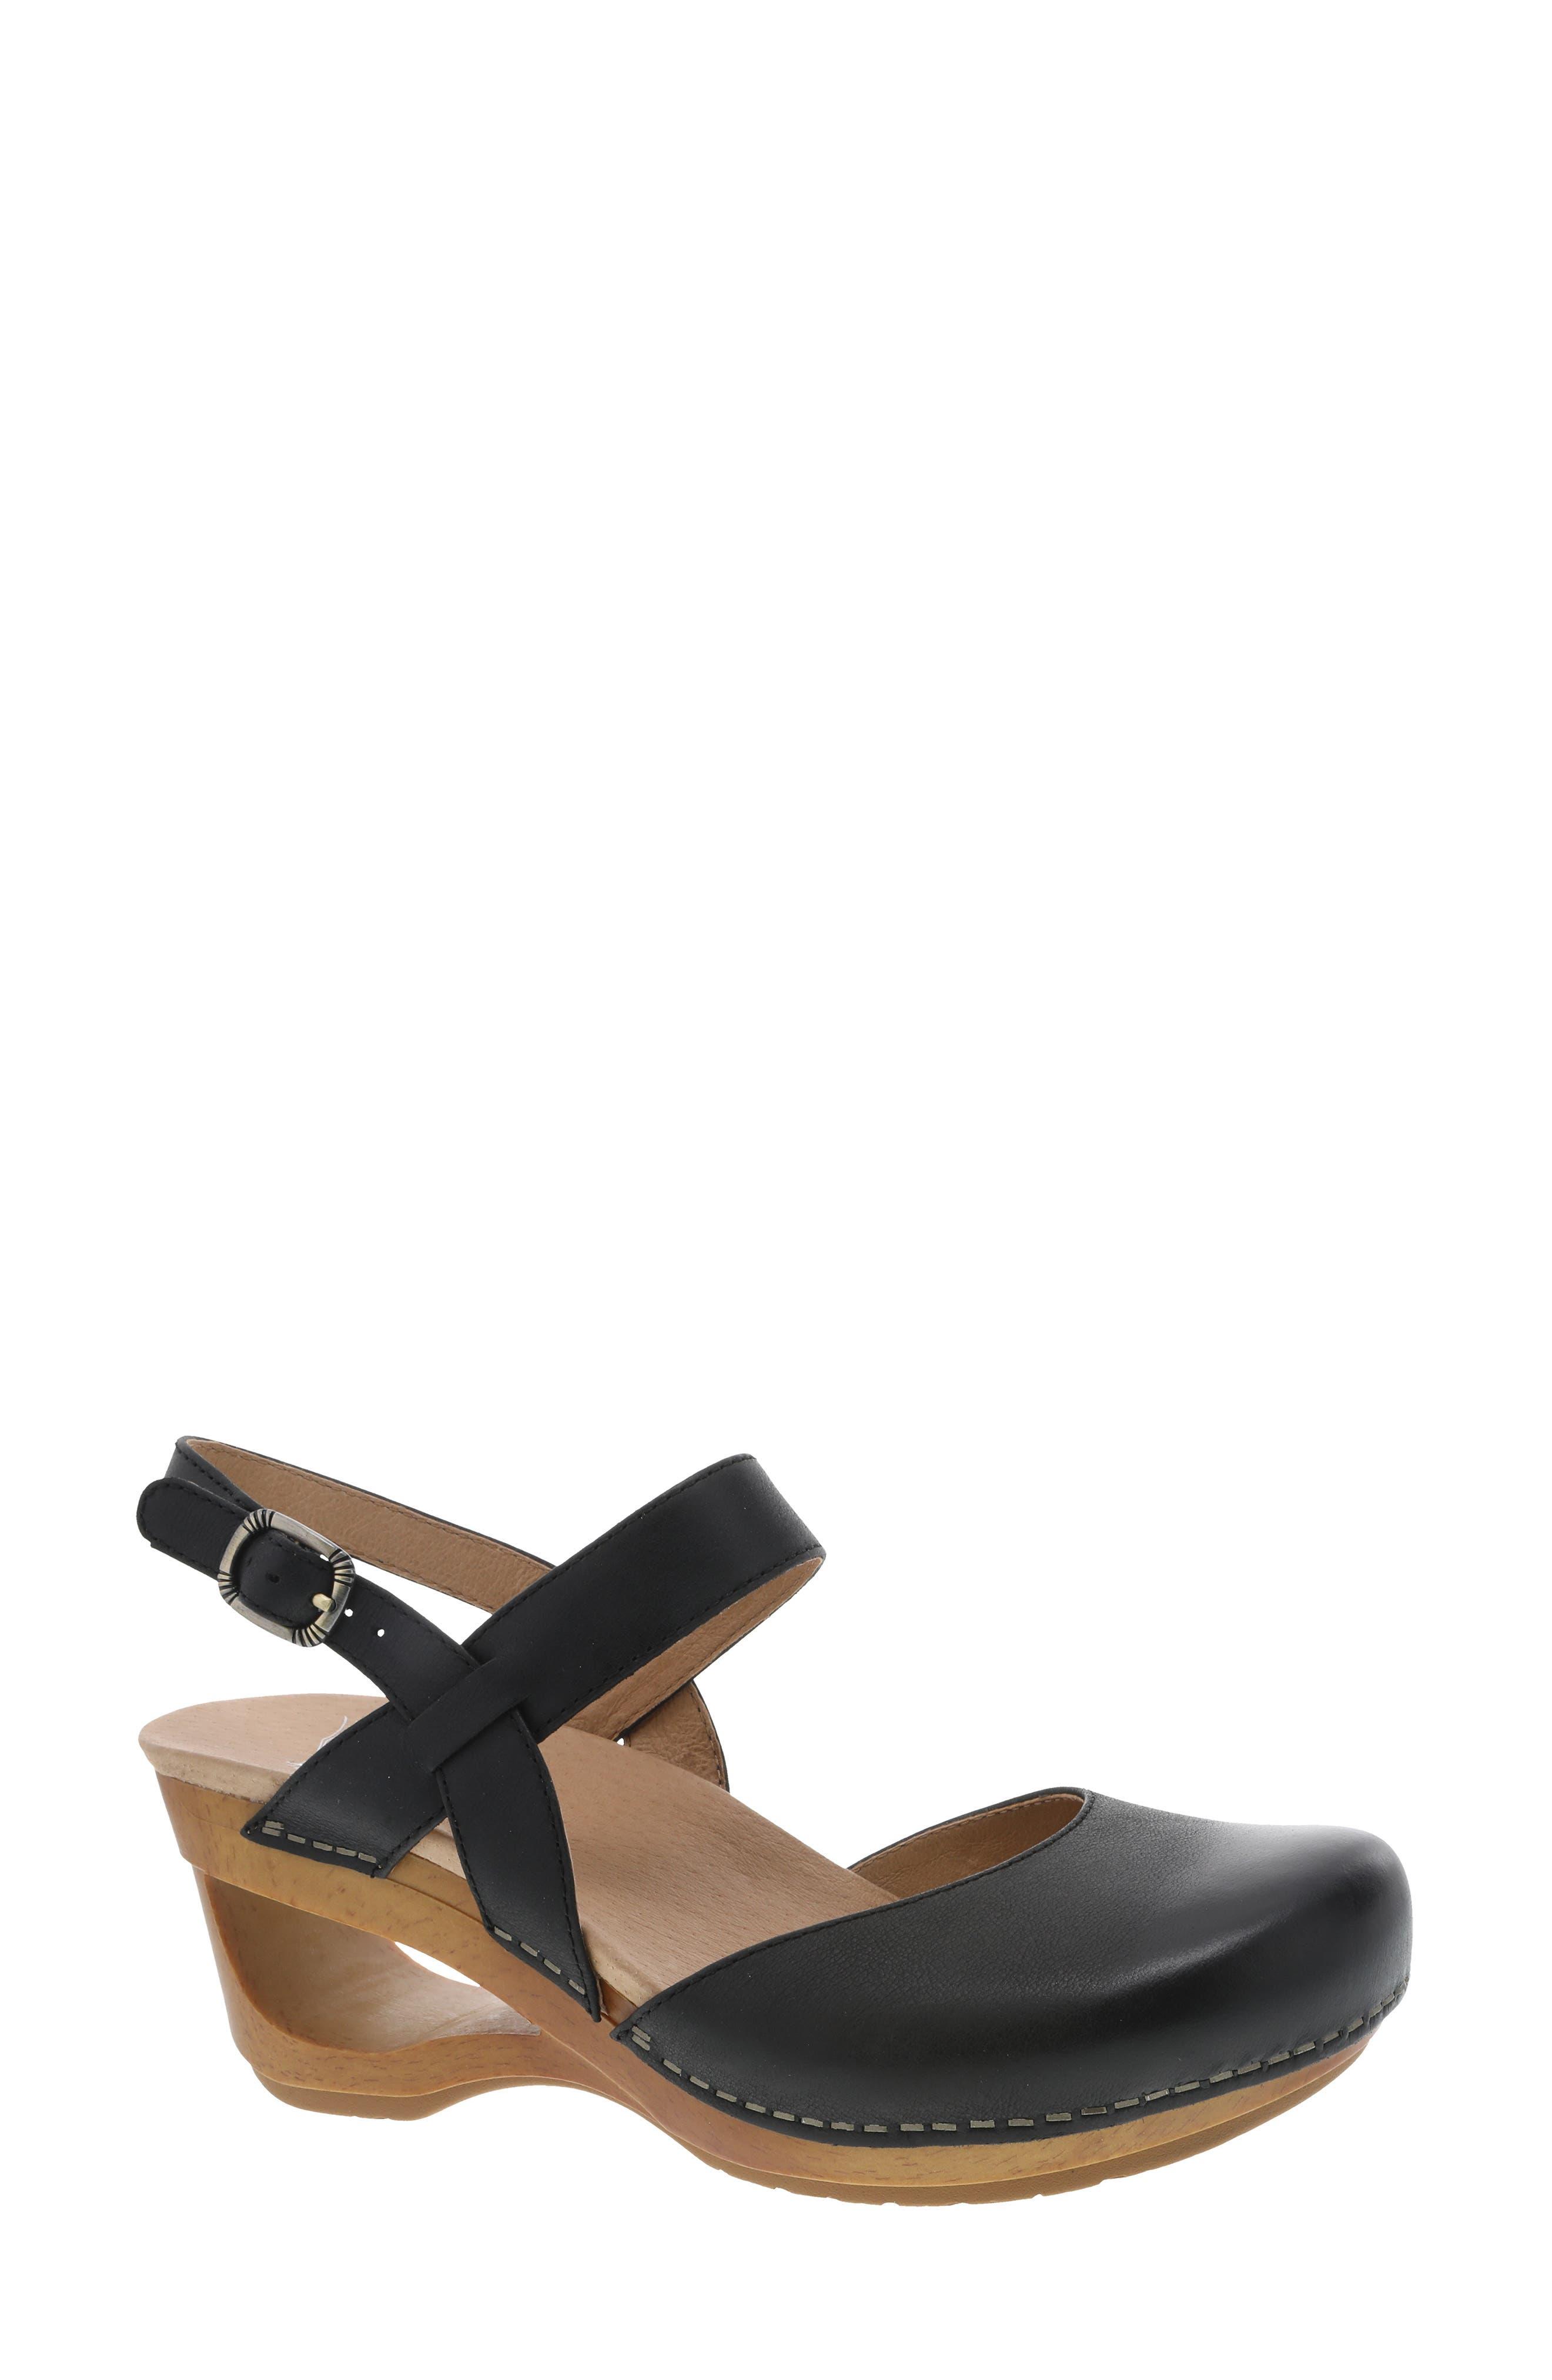 Taci Slingback Clog Sandal